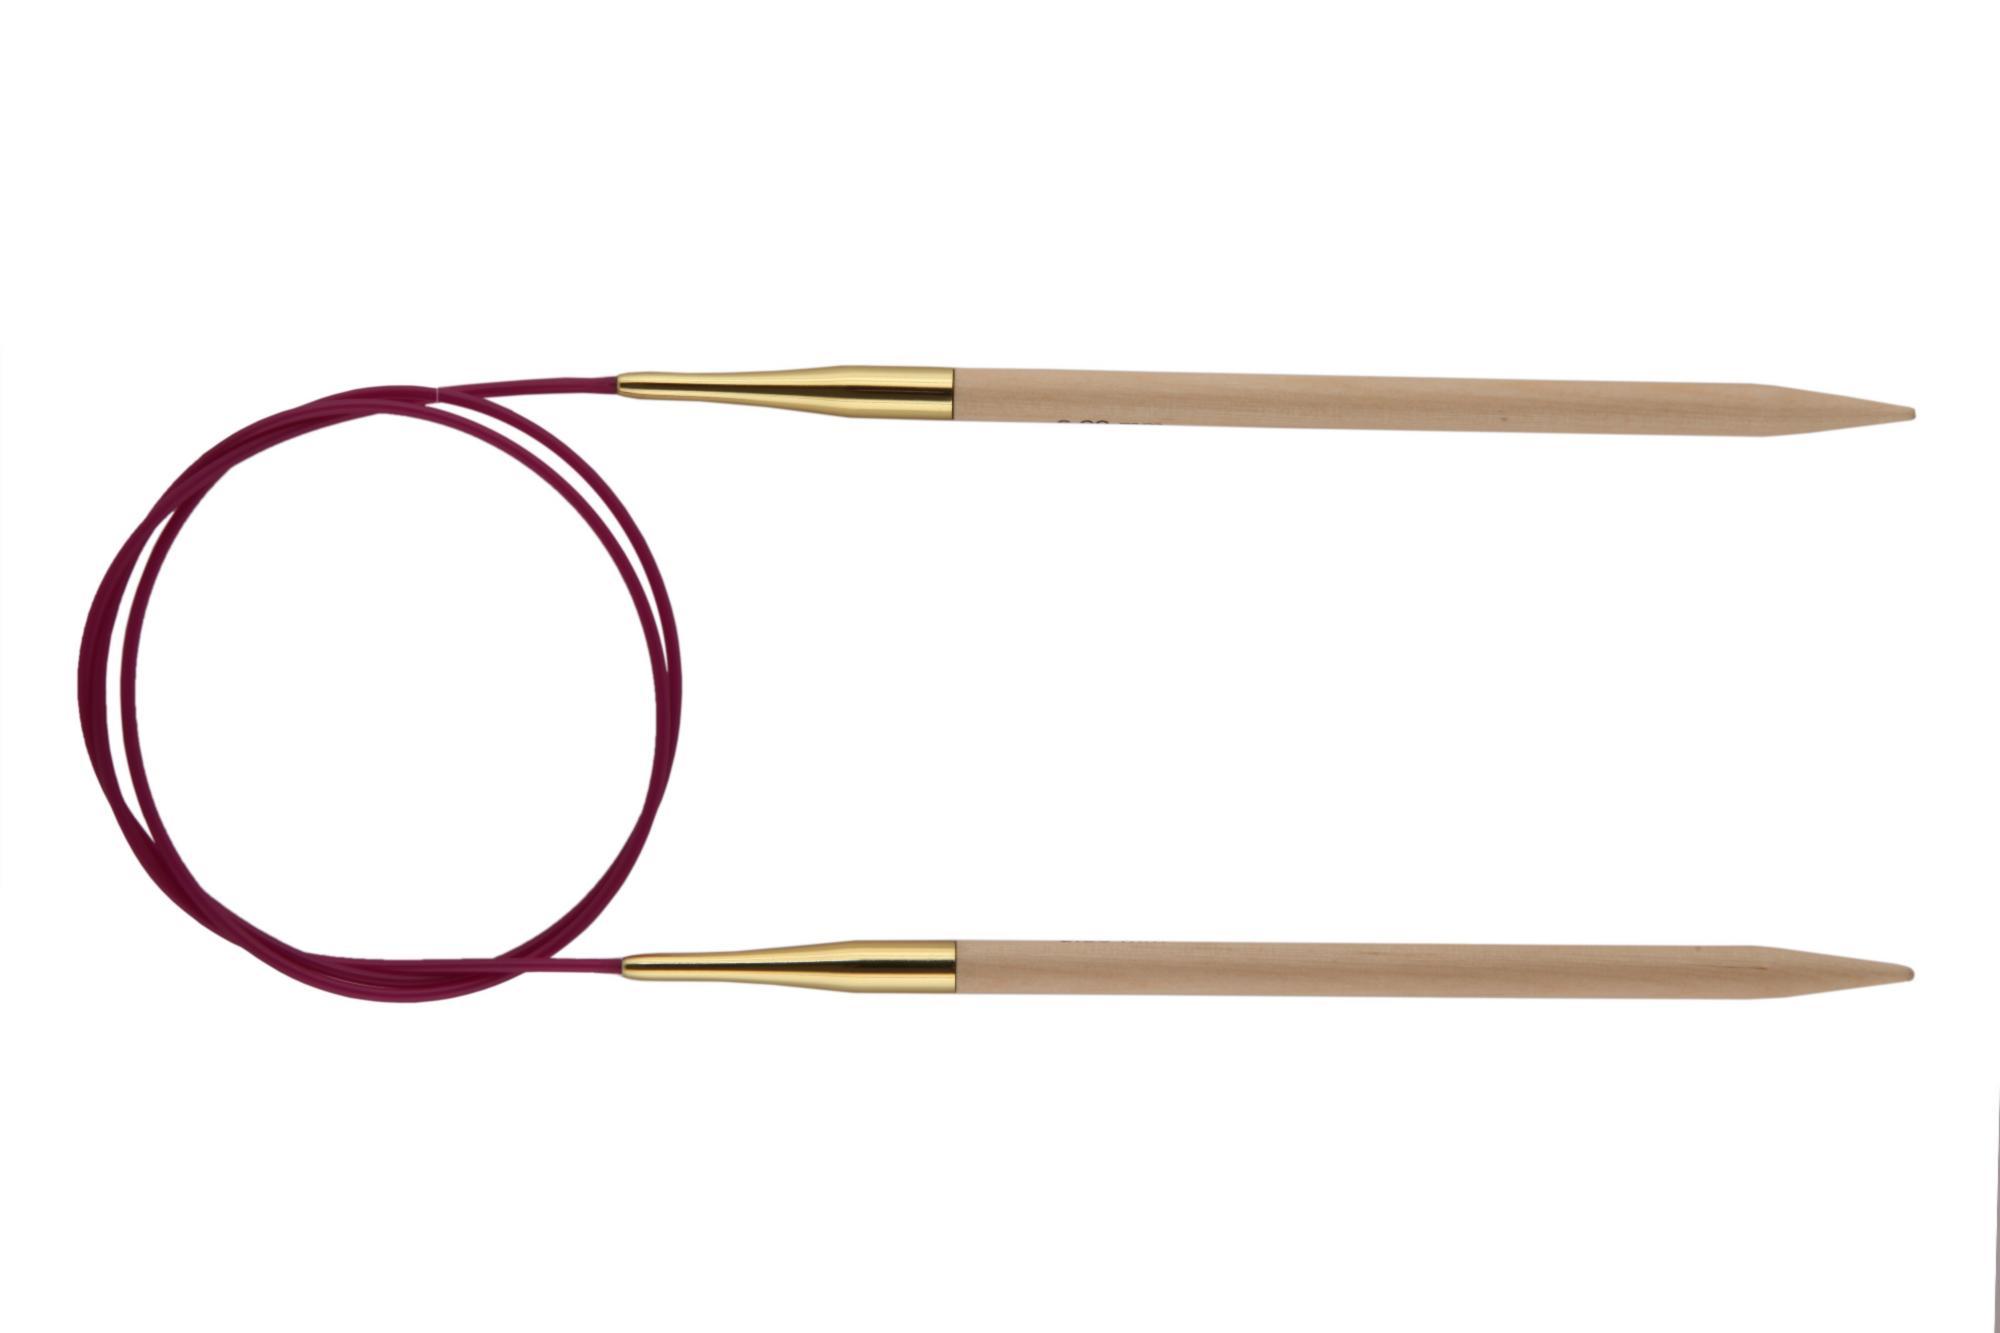 Спицы круговые 80 см Basix Birch Wood KnitPro, 35385, 4.50 мм